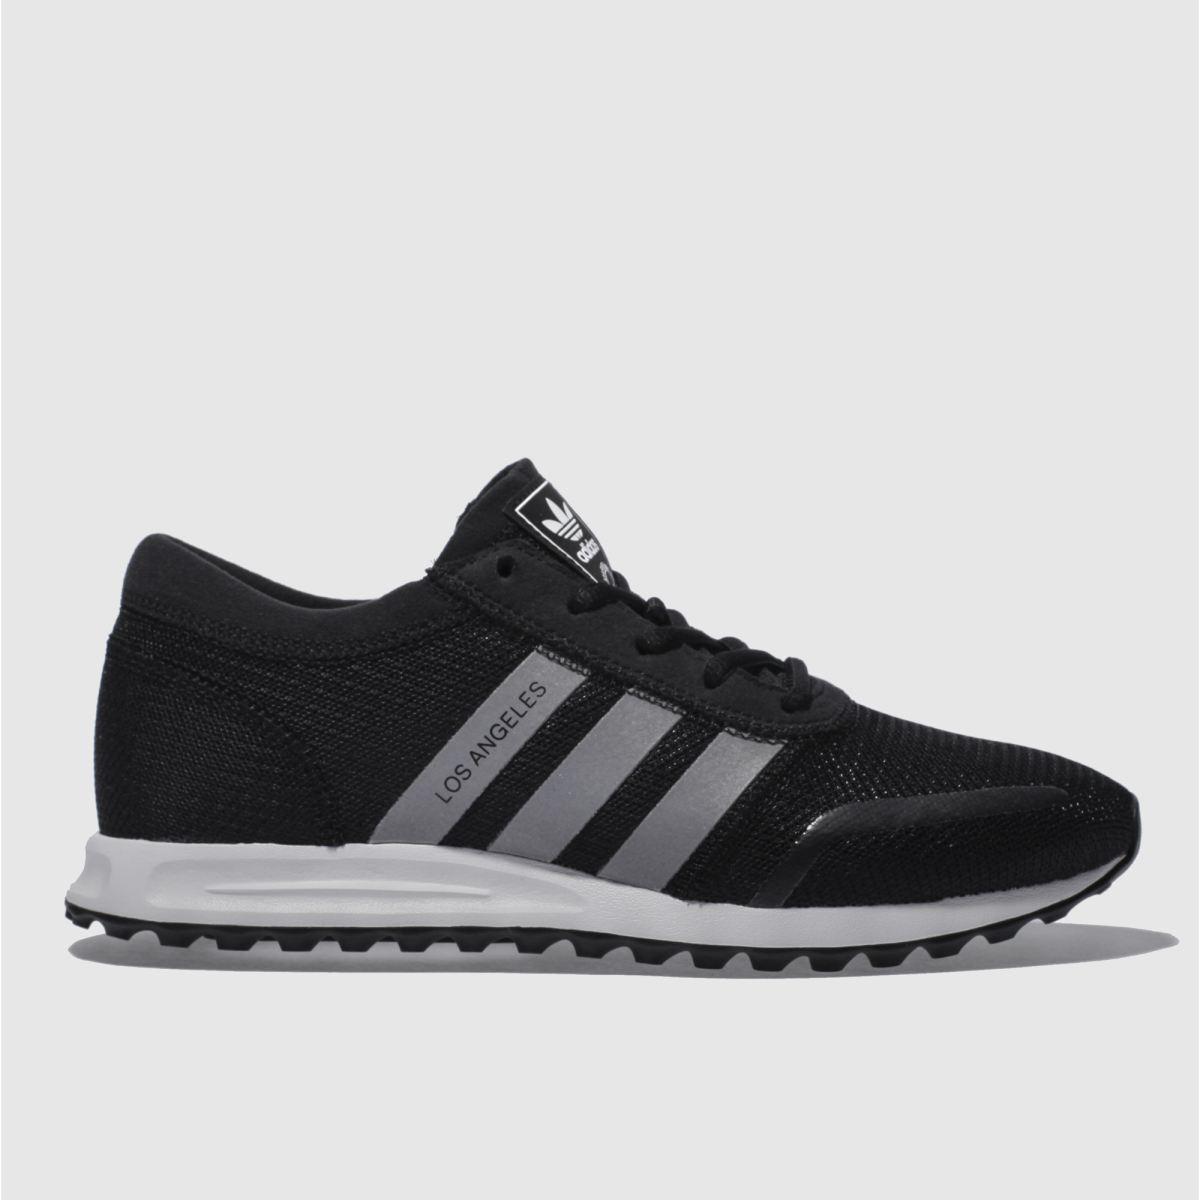 adidas black & white adi los angeles trainers